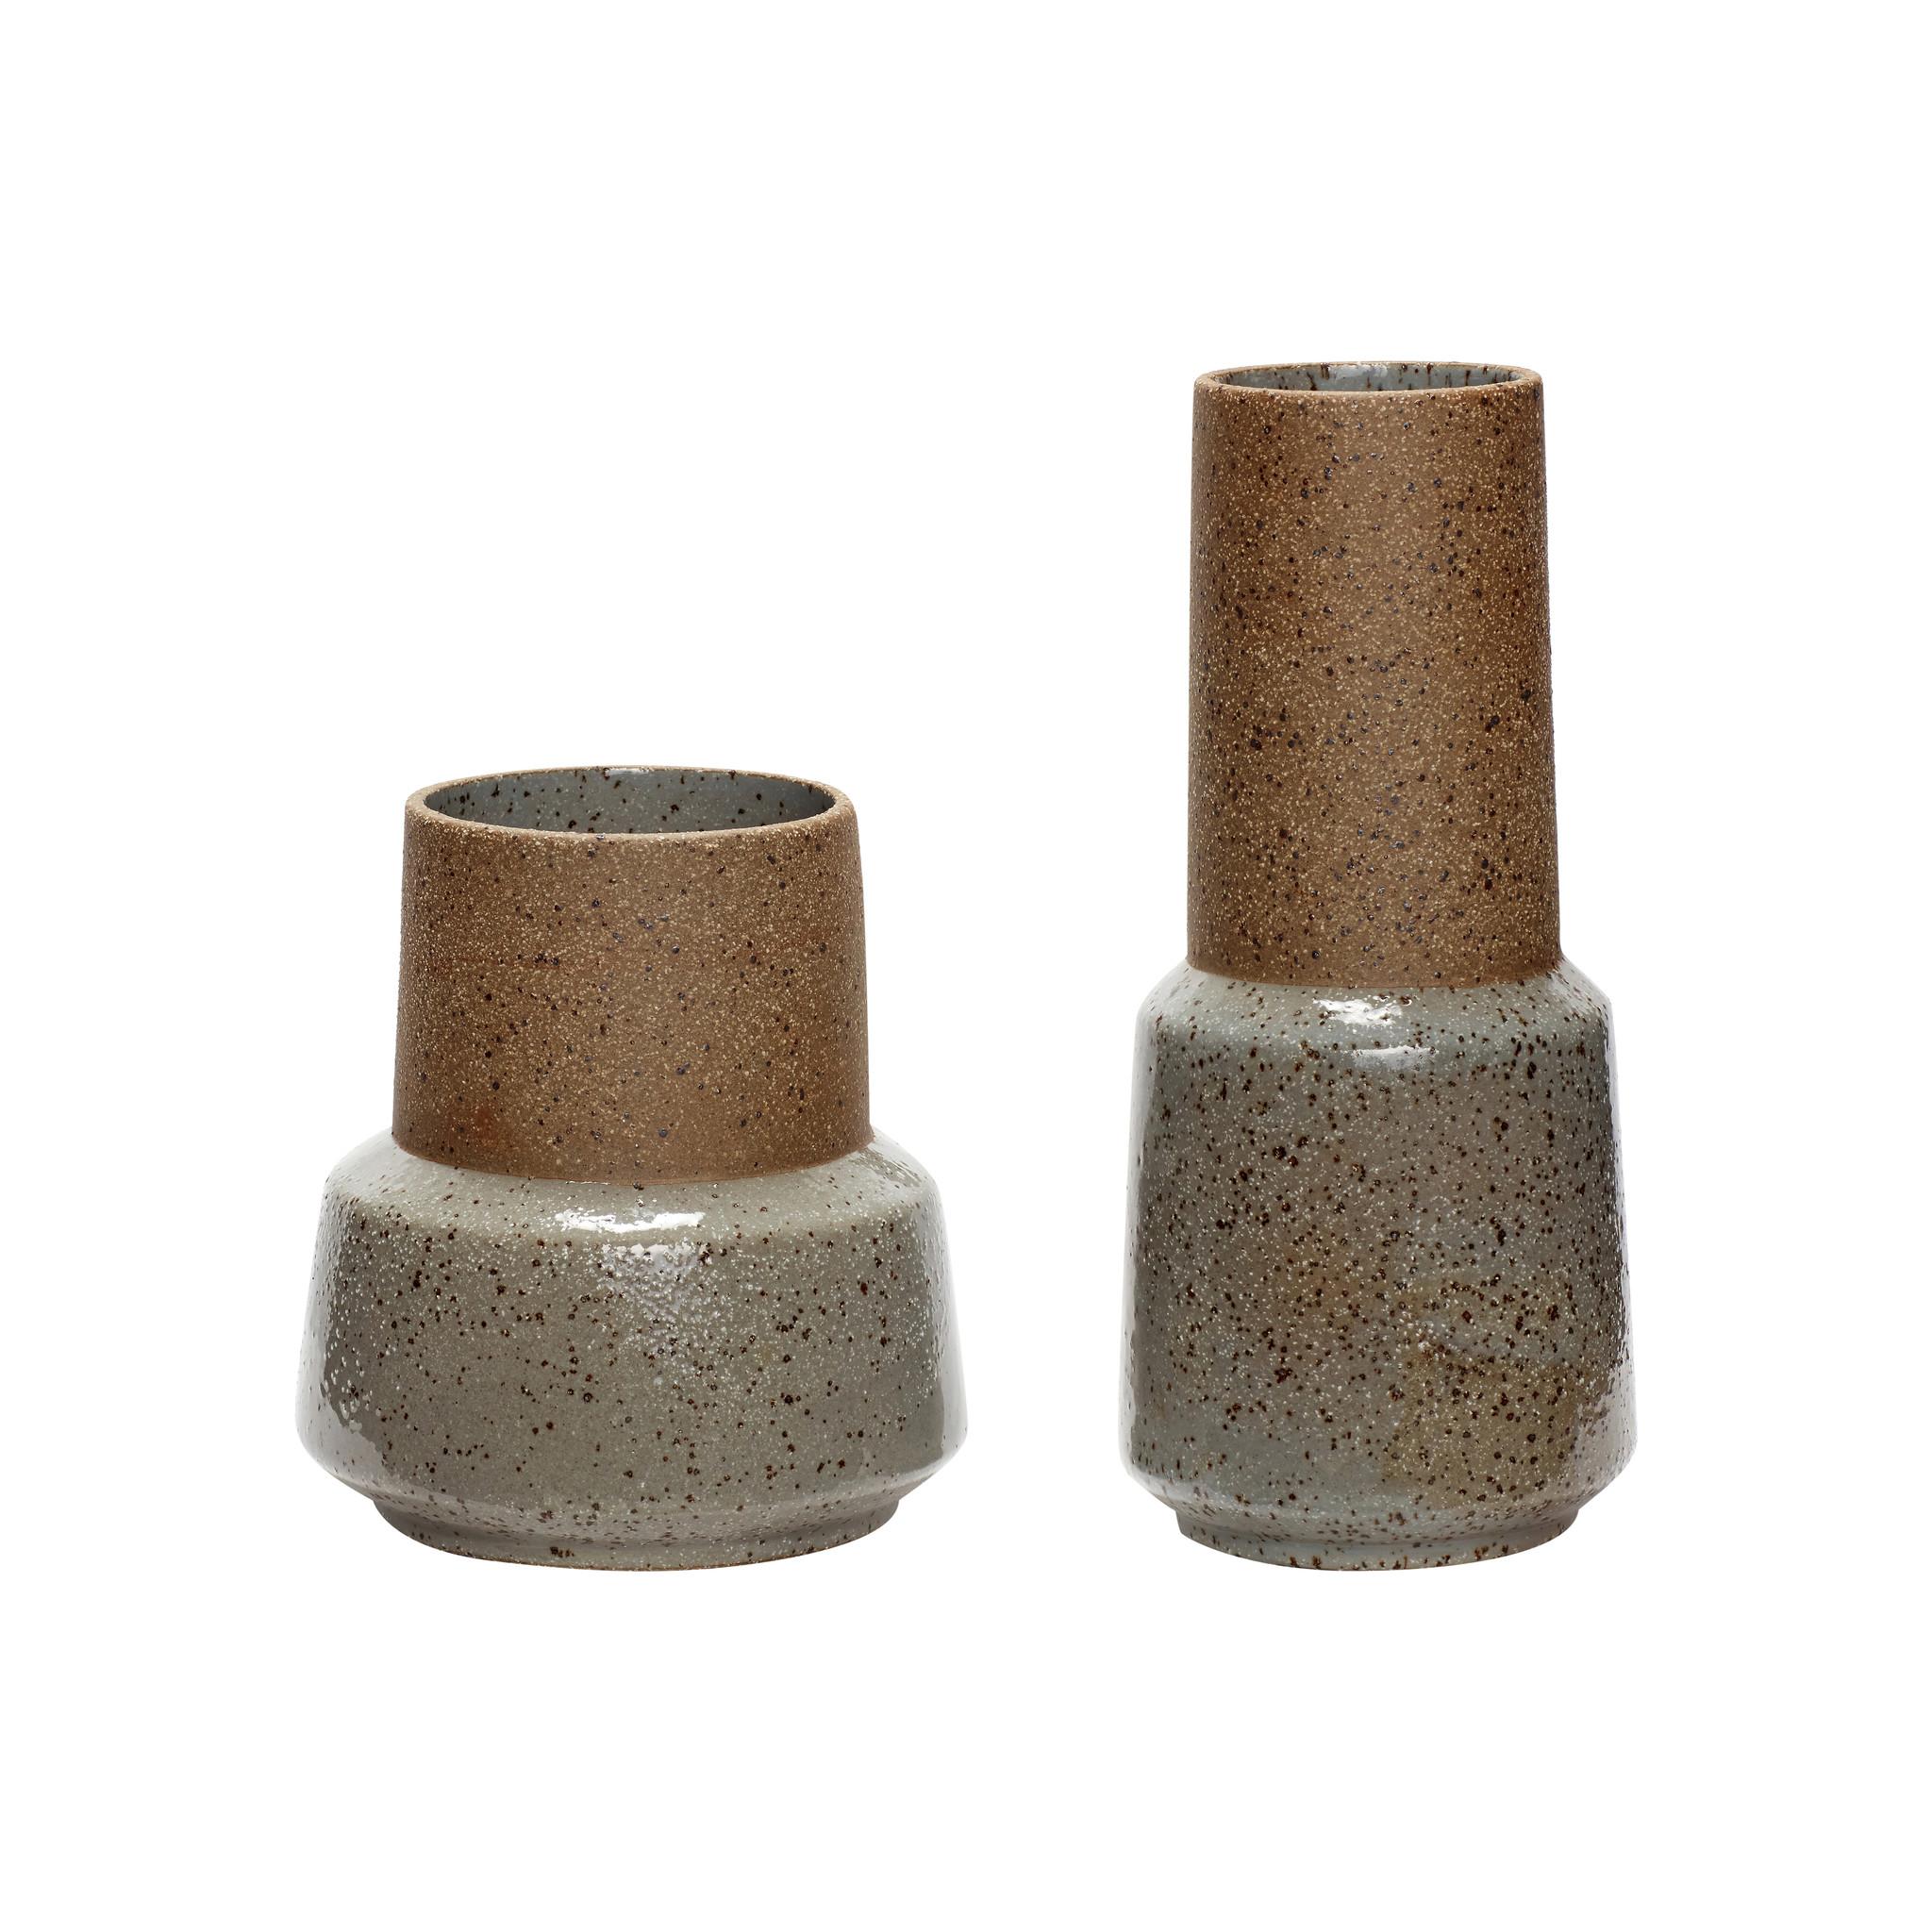 Hubsch Vaas, keramiek, zand / groen, set van 2-760404-5712772059517